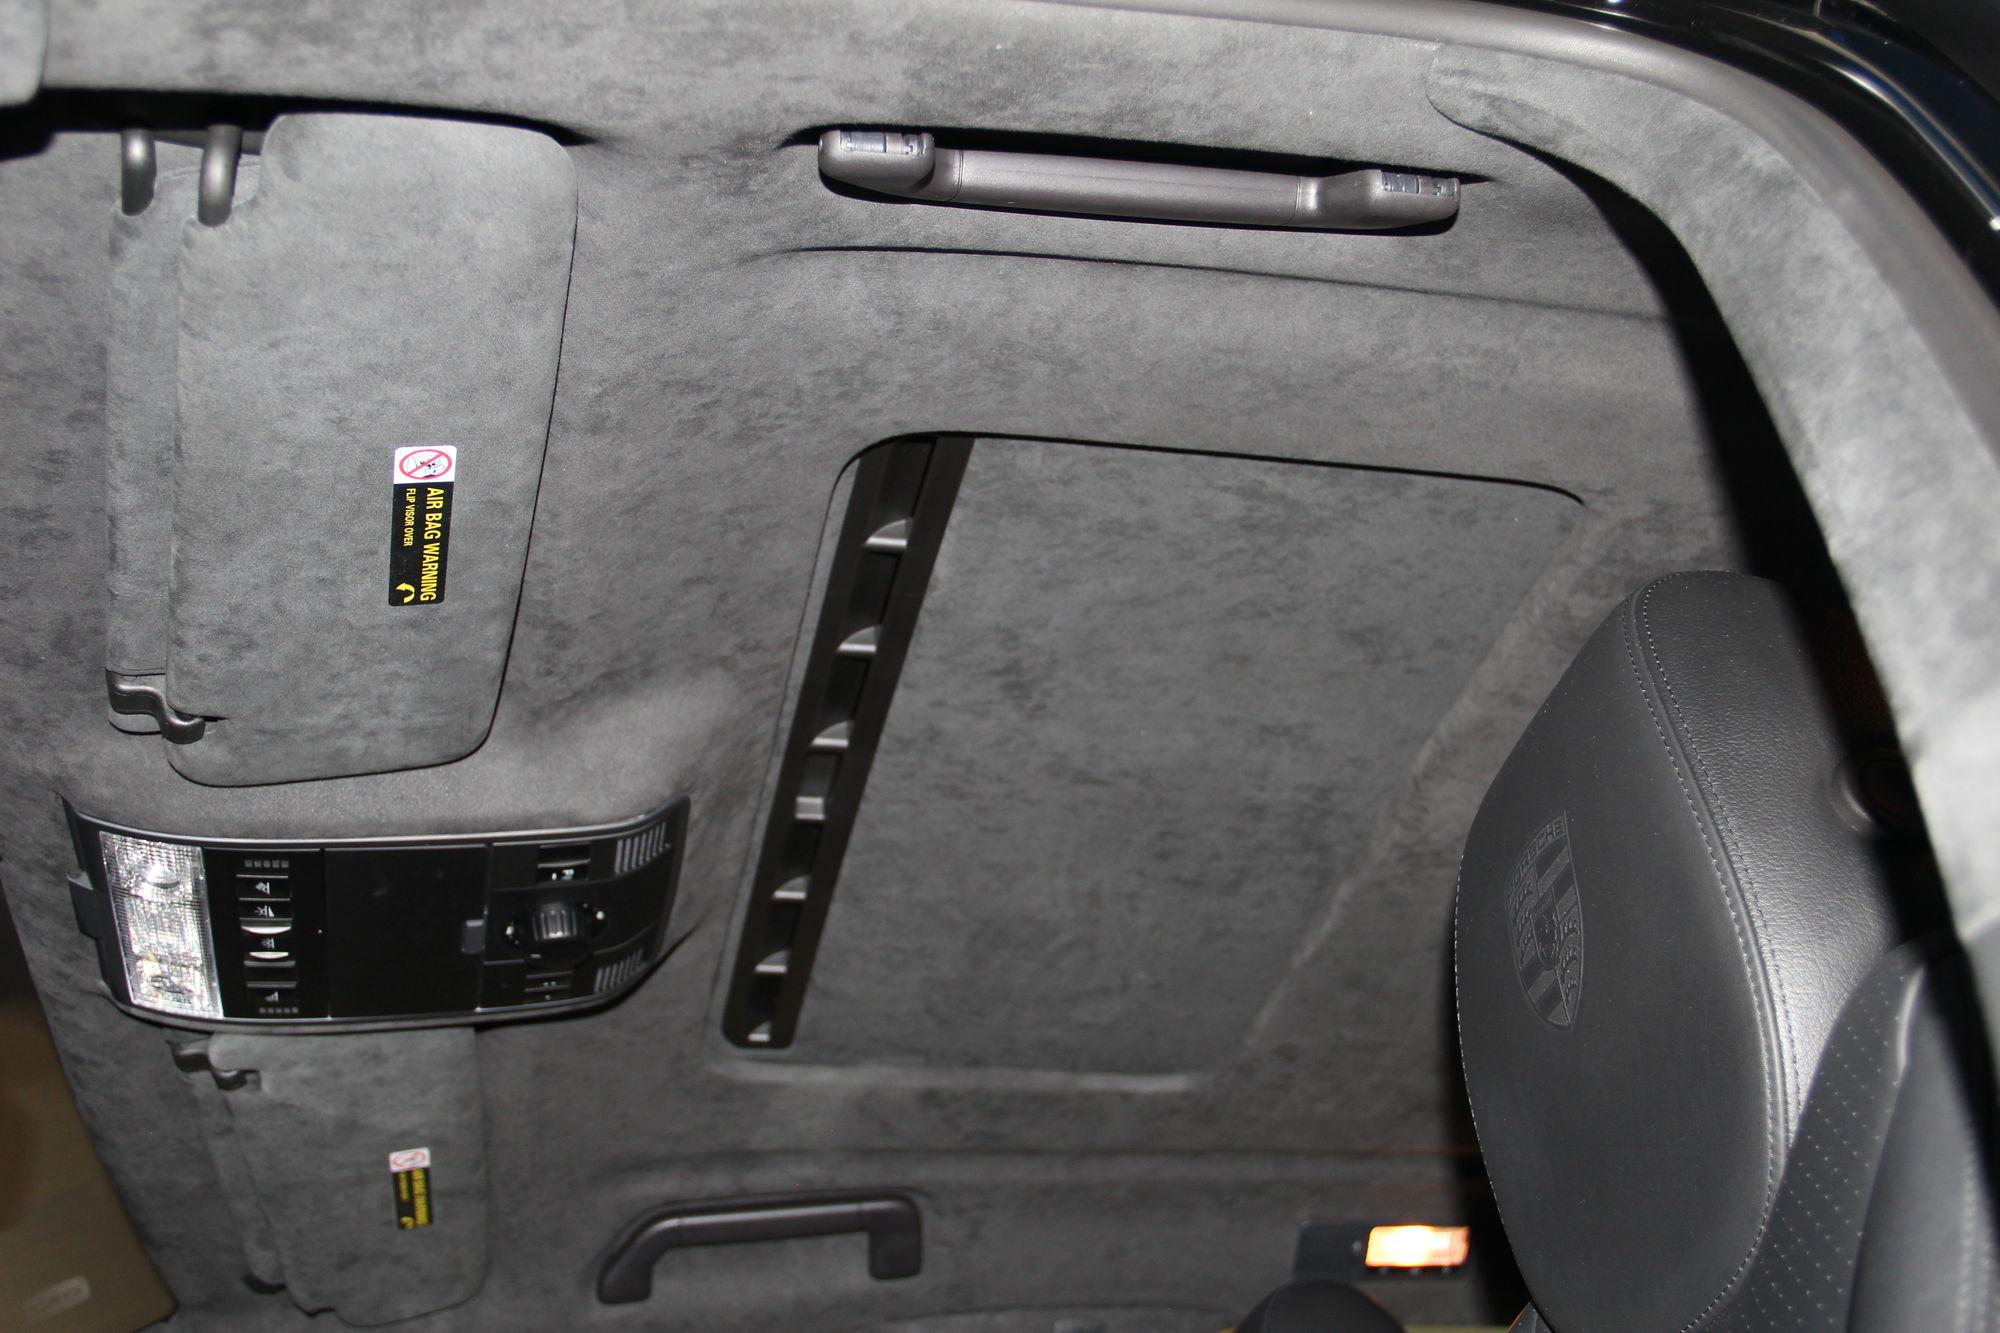 White Carbon Fiber Porsche 911 Gt3 Remote Controller Key Fob